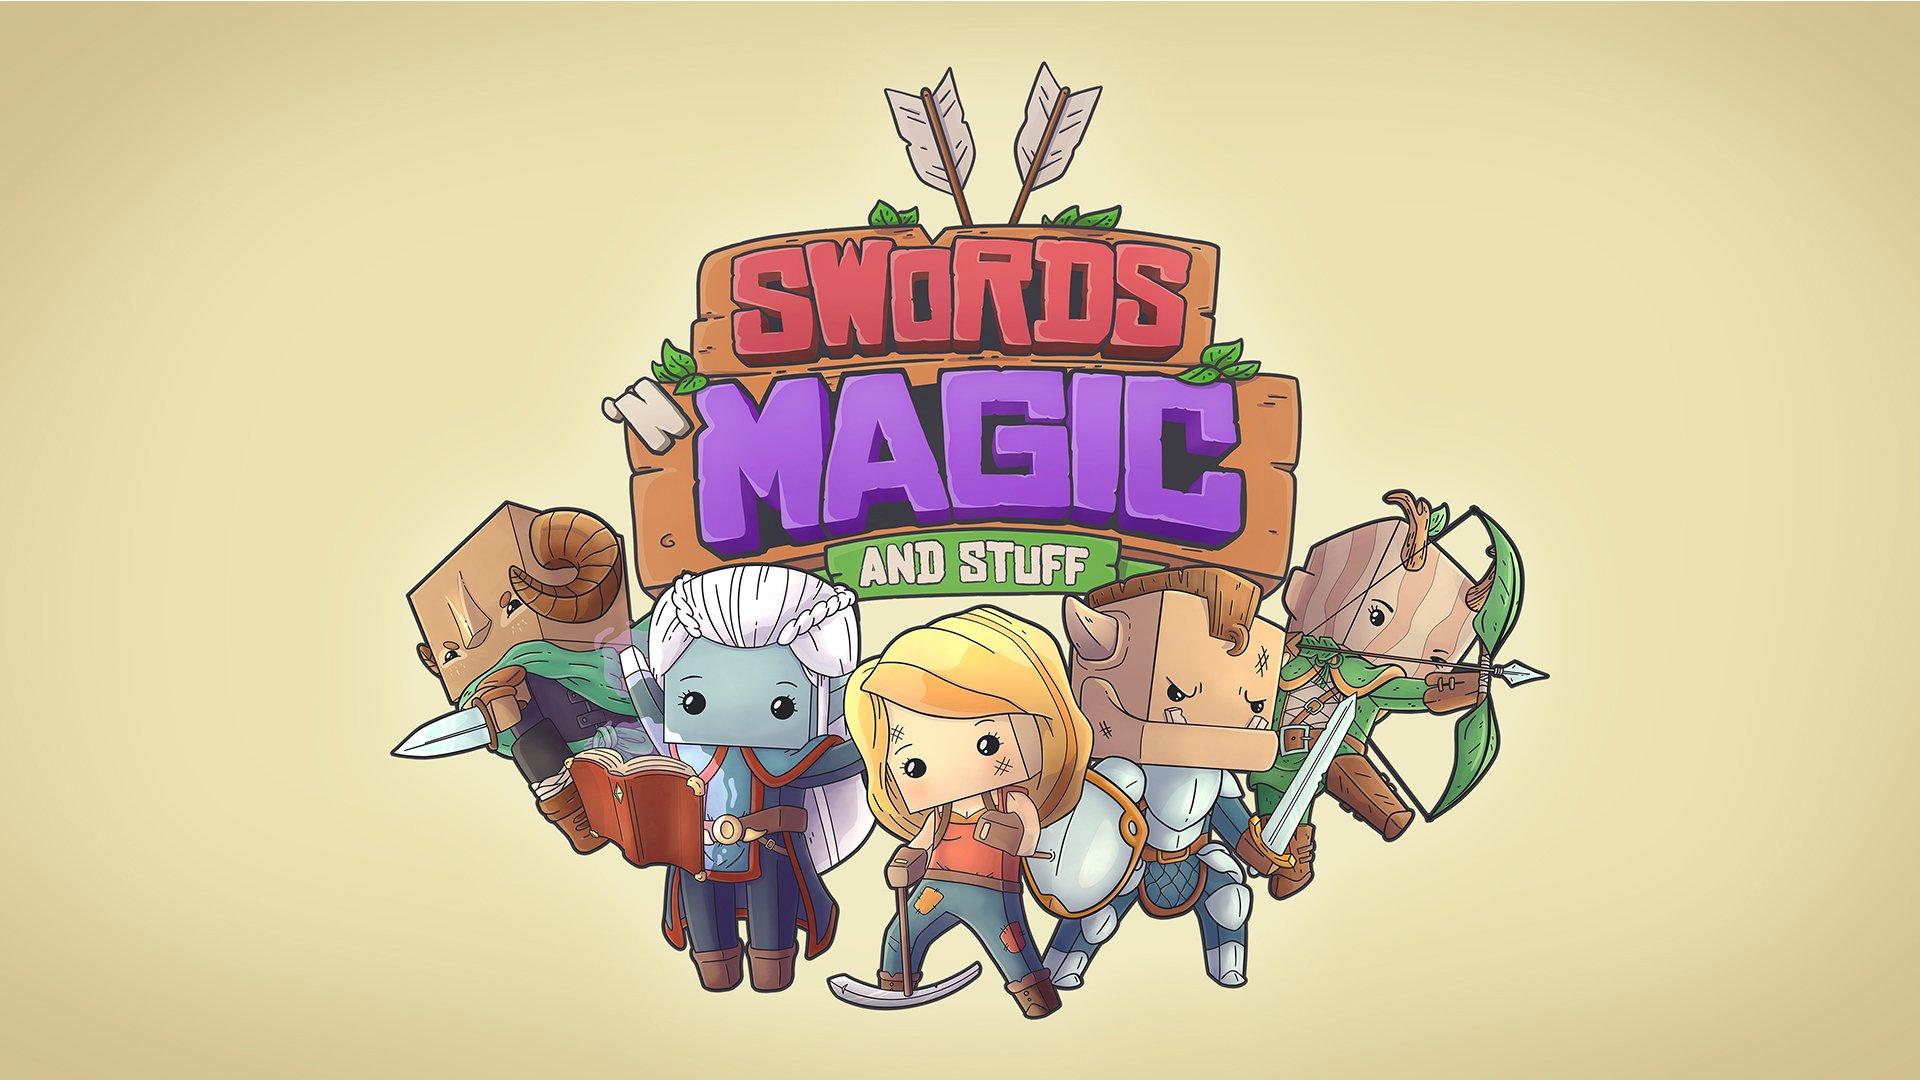 Swords 'n Magic and Stuff